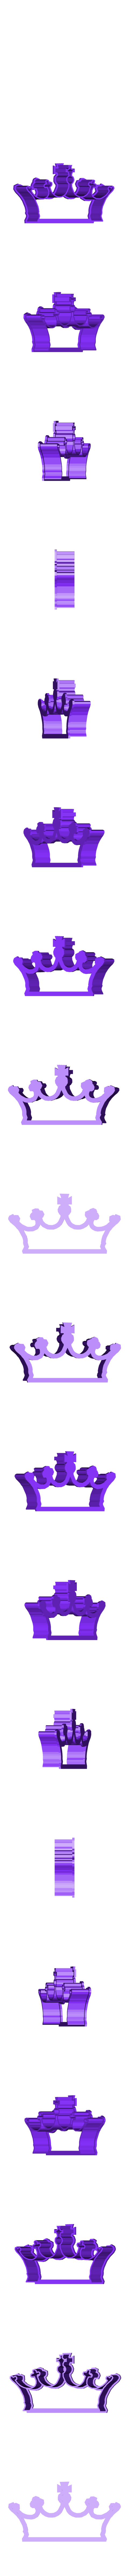 crown 3.stl Download STL file Crown cookie cutter set • 3D printer design, davidruizo